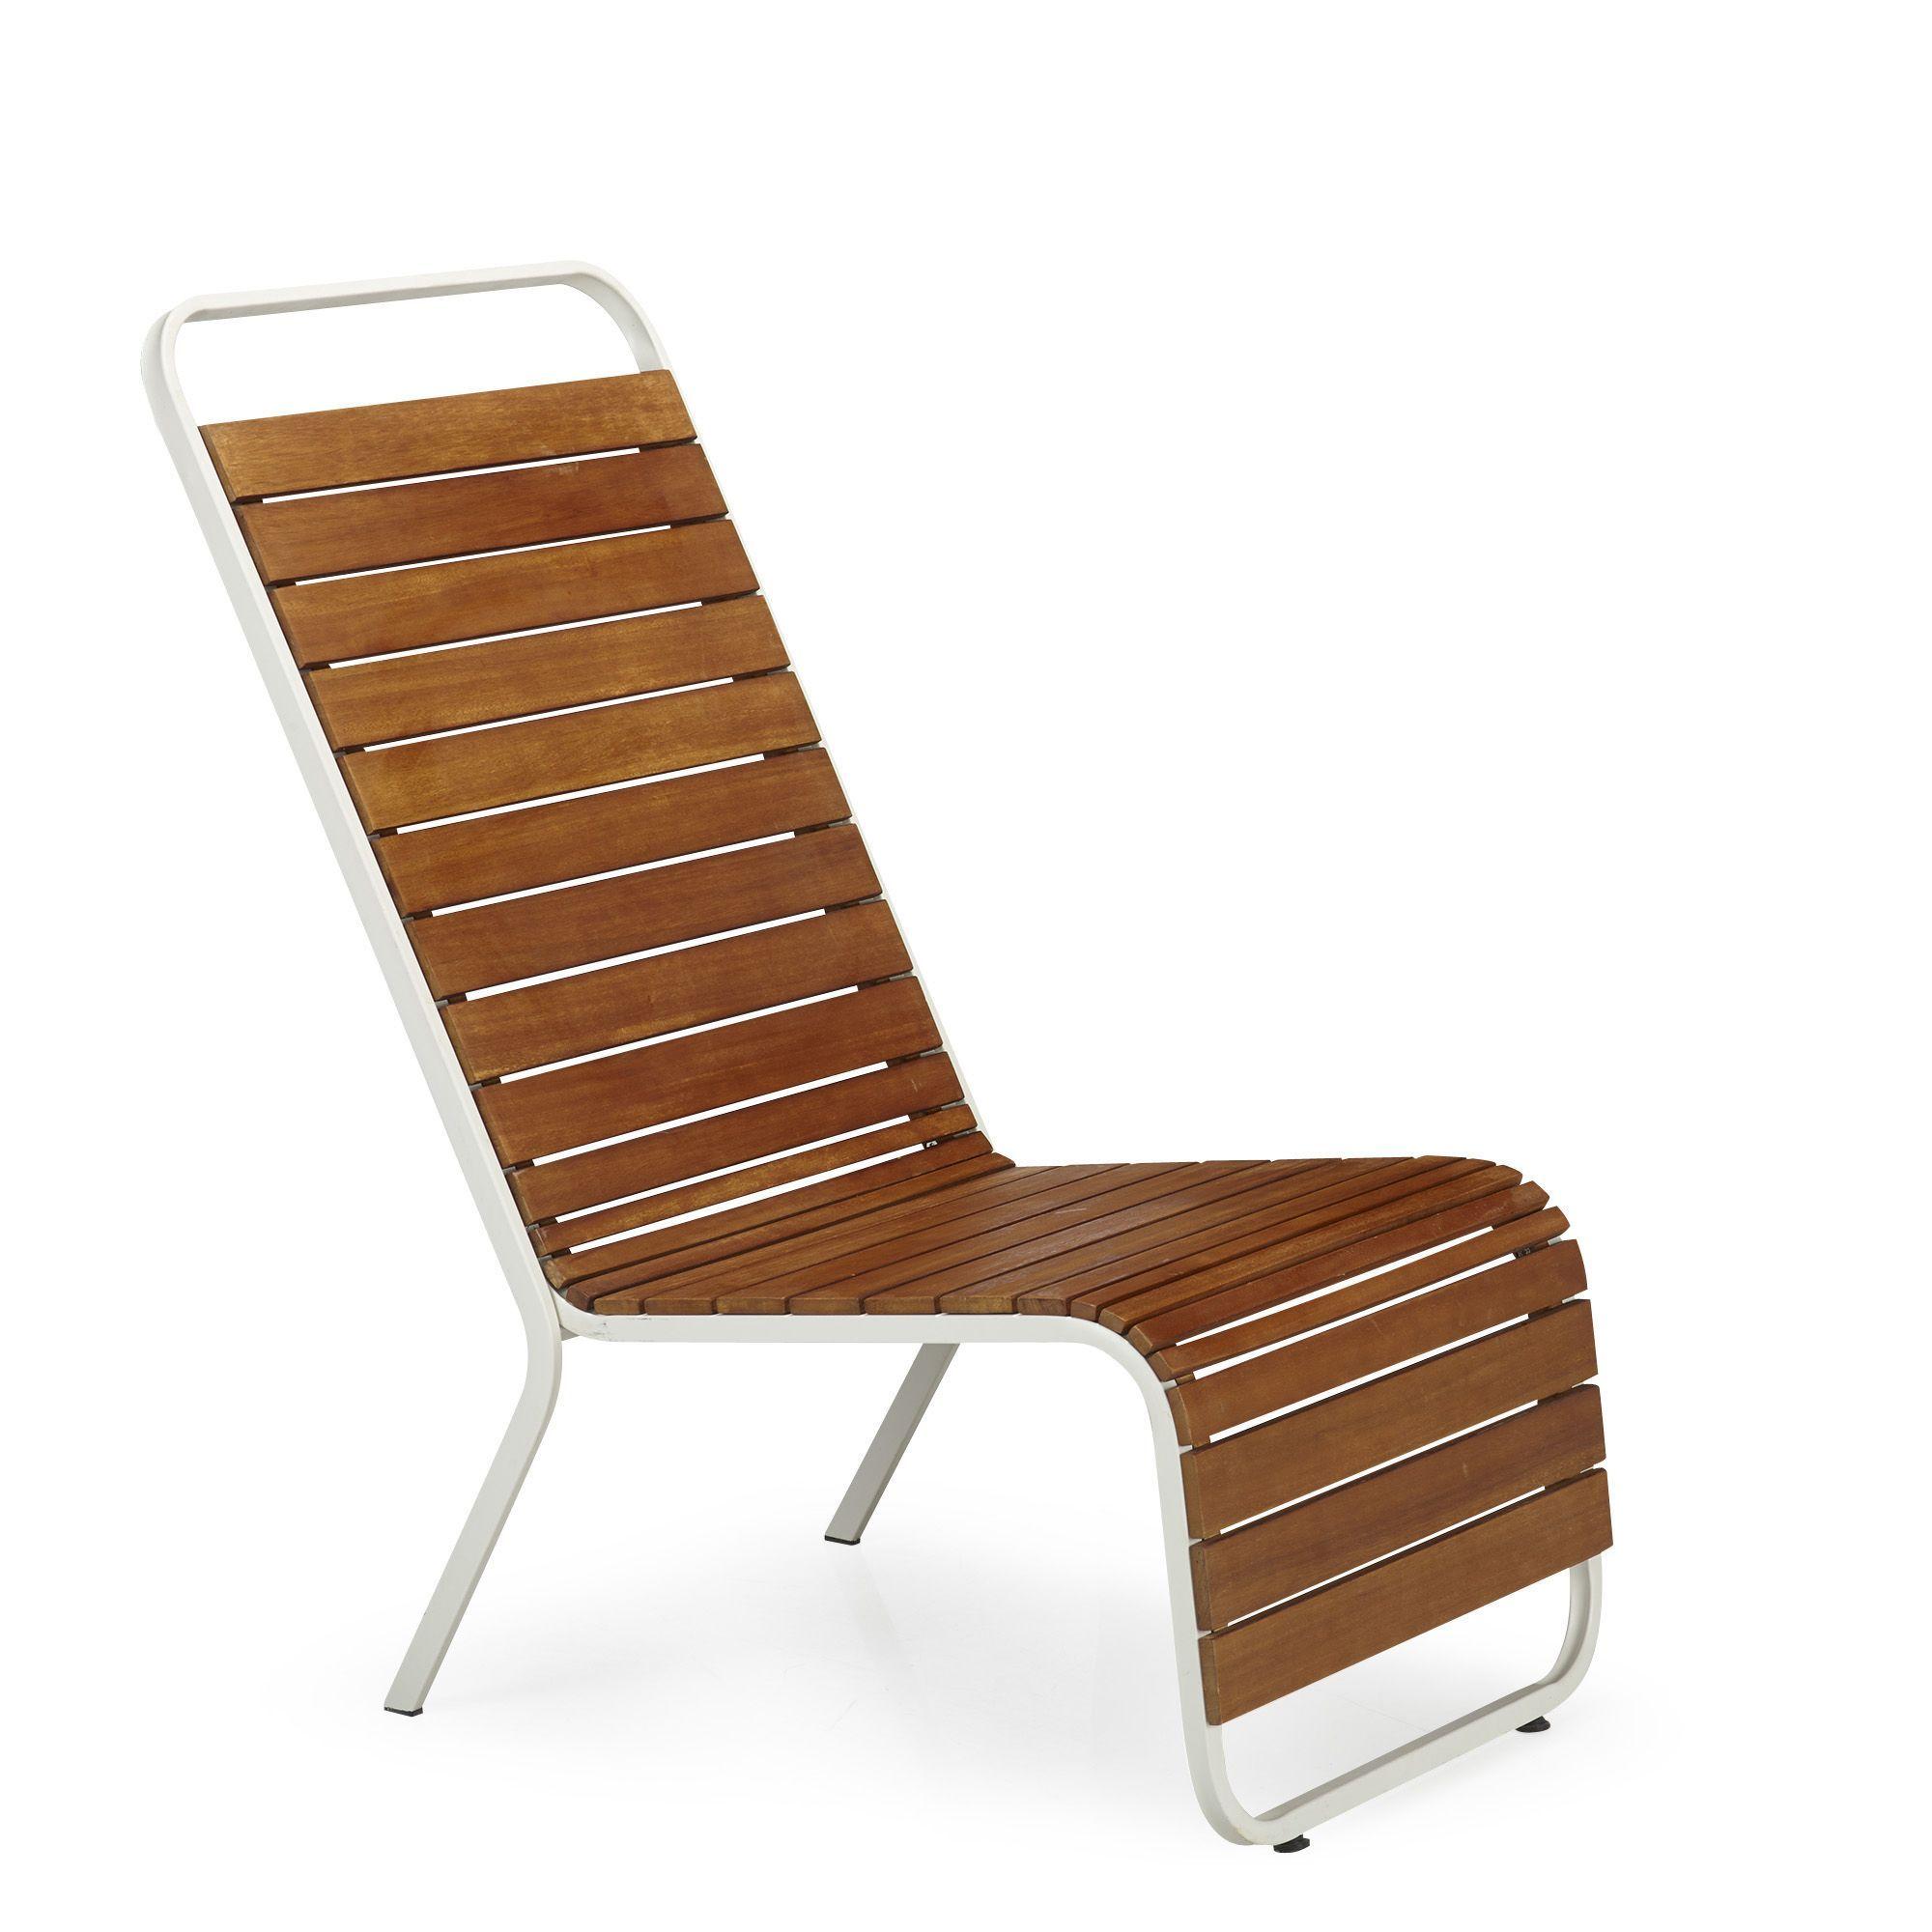 Fauteuil de jardin relax Blanc mat - Extenso - Les fauteuils de ...